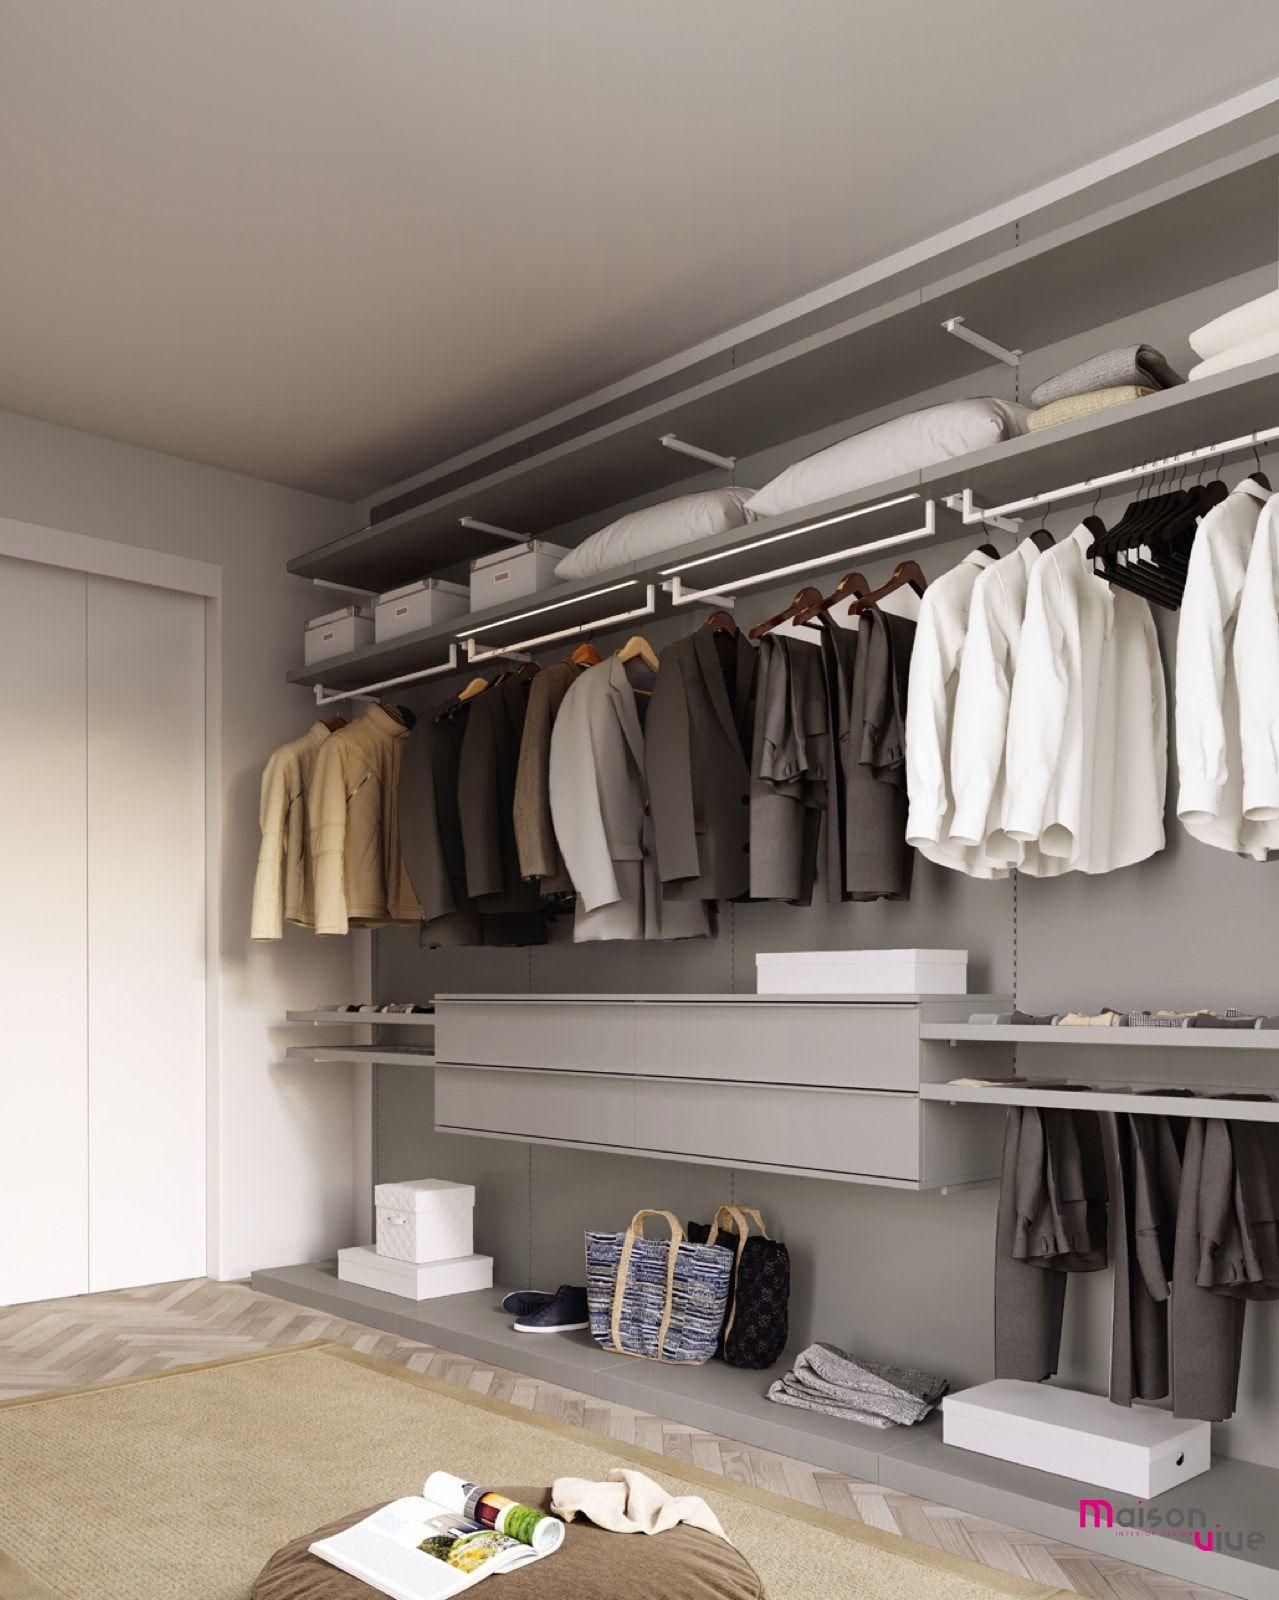 Cabine armadio moderne